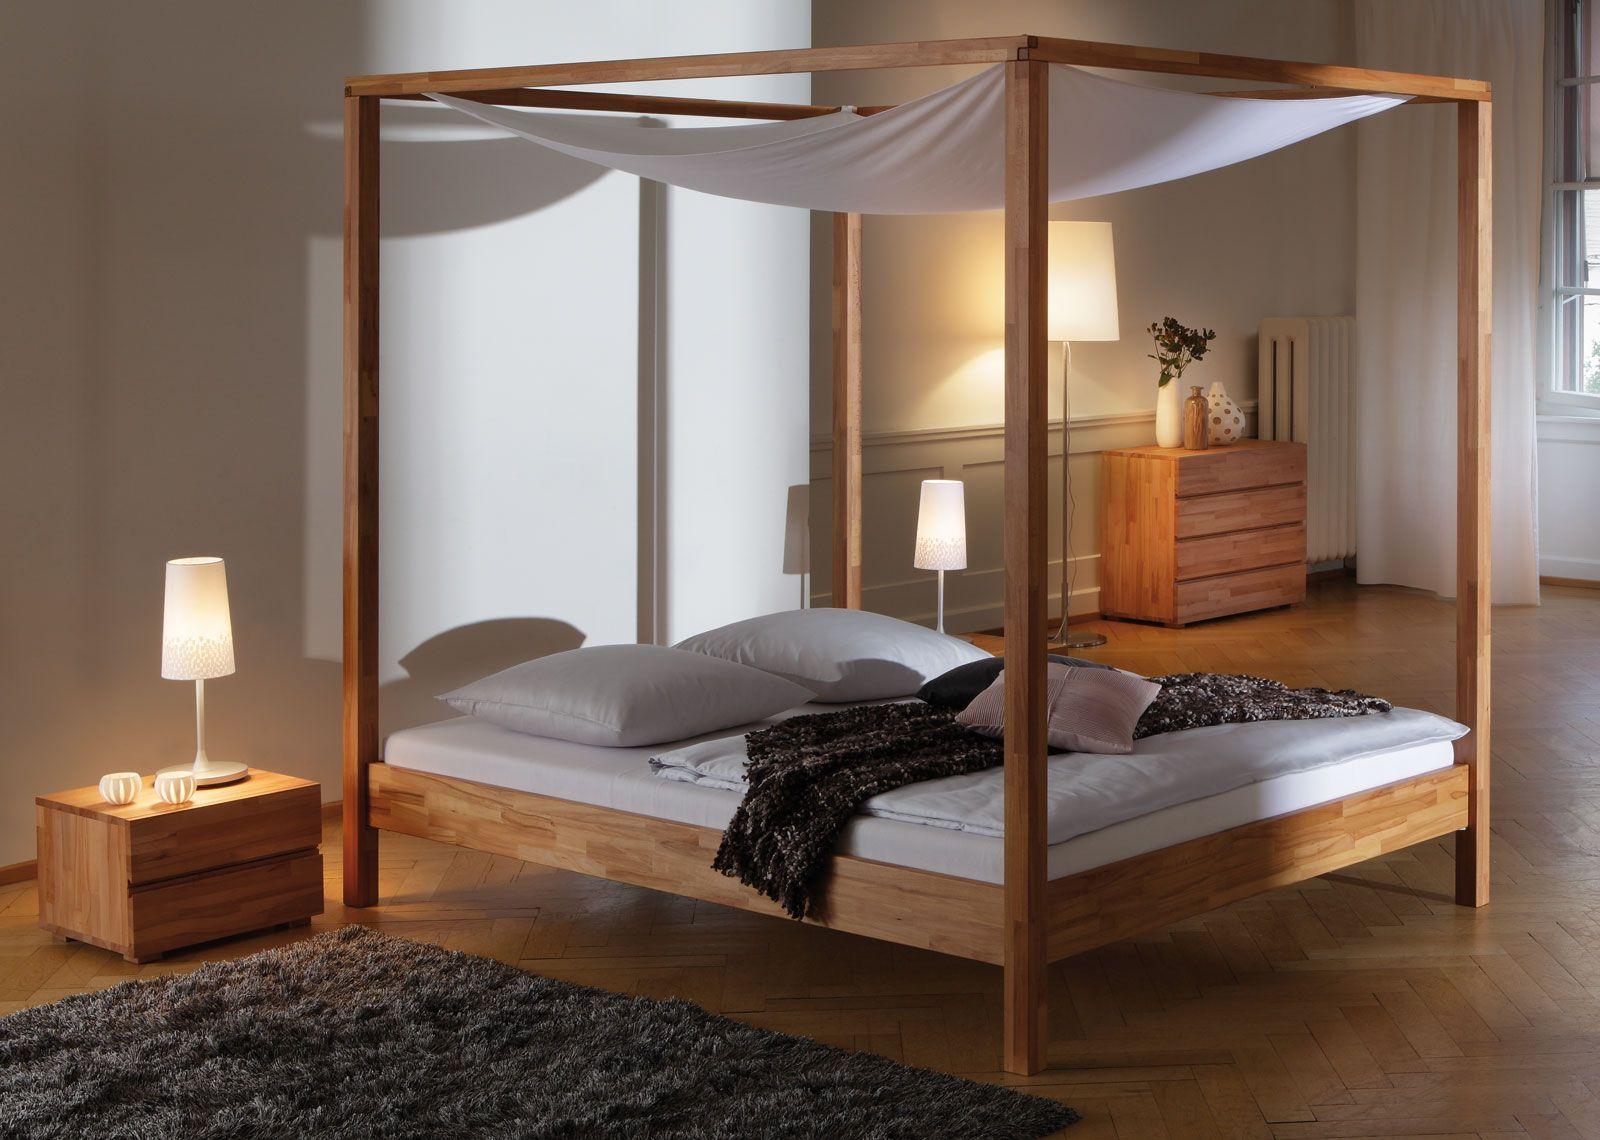 himmelbett merida betten pinterest himmelbett betten und baldachin. Black Bedroom Furniture Sets. Home Design Ideas